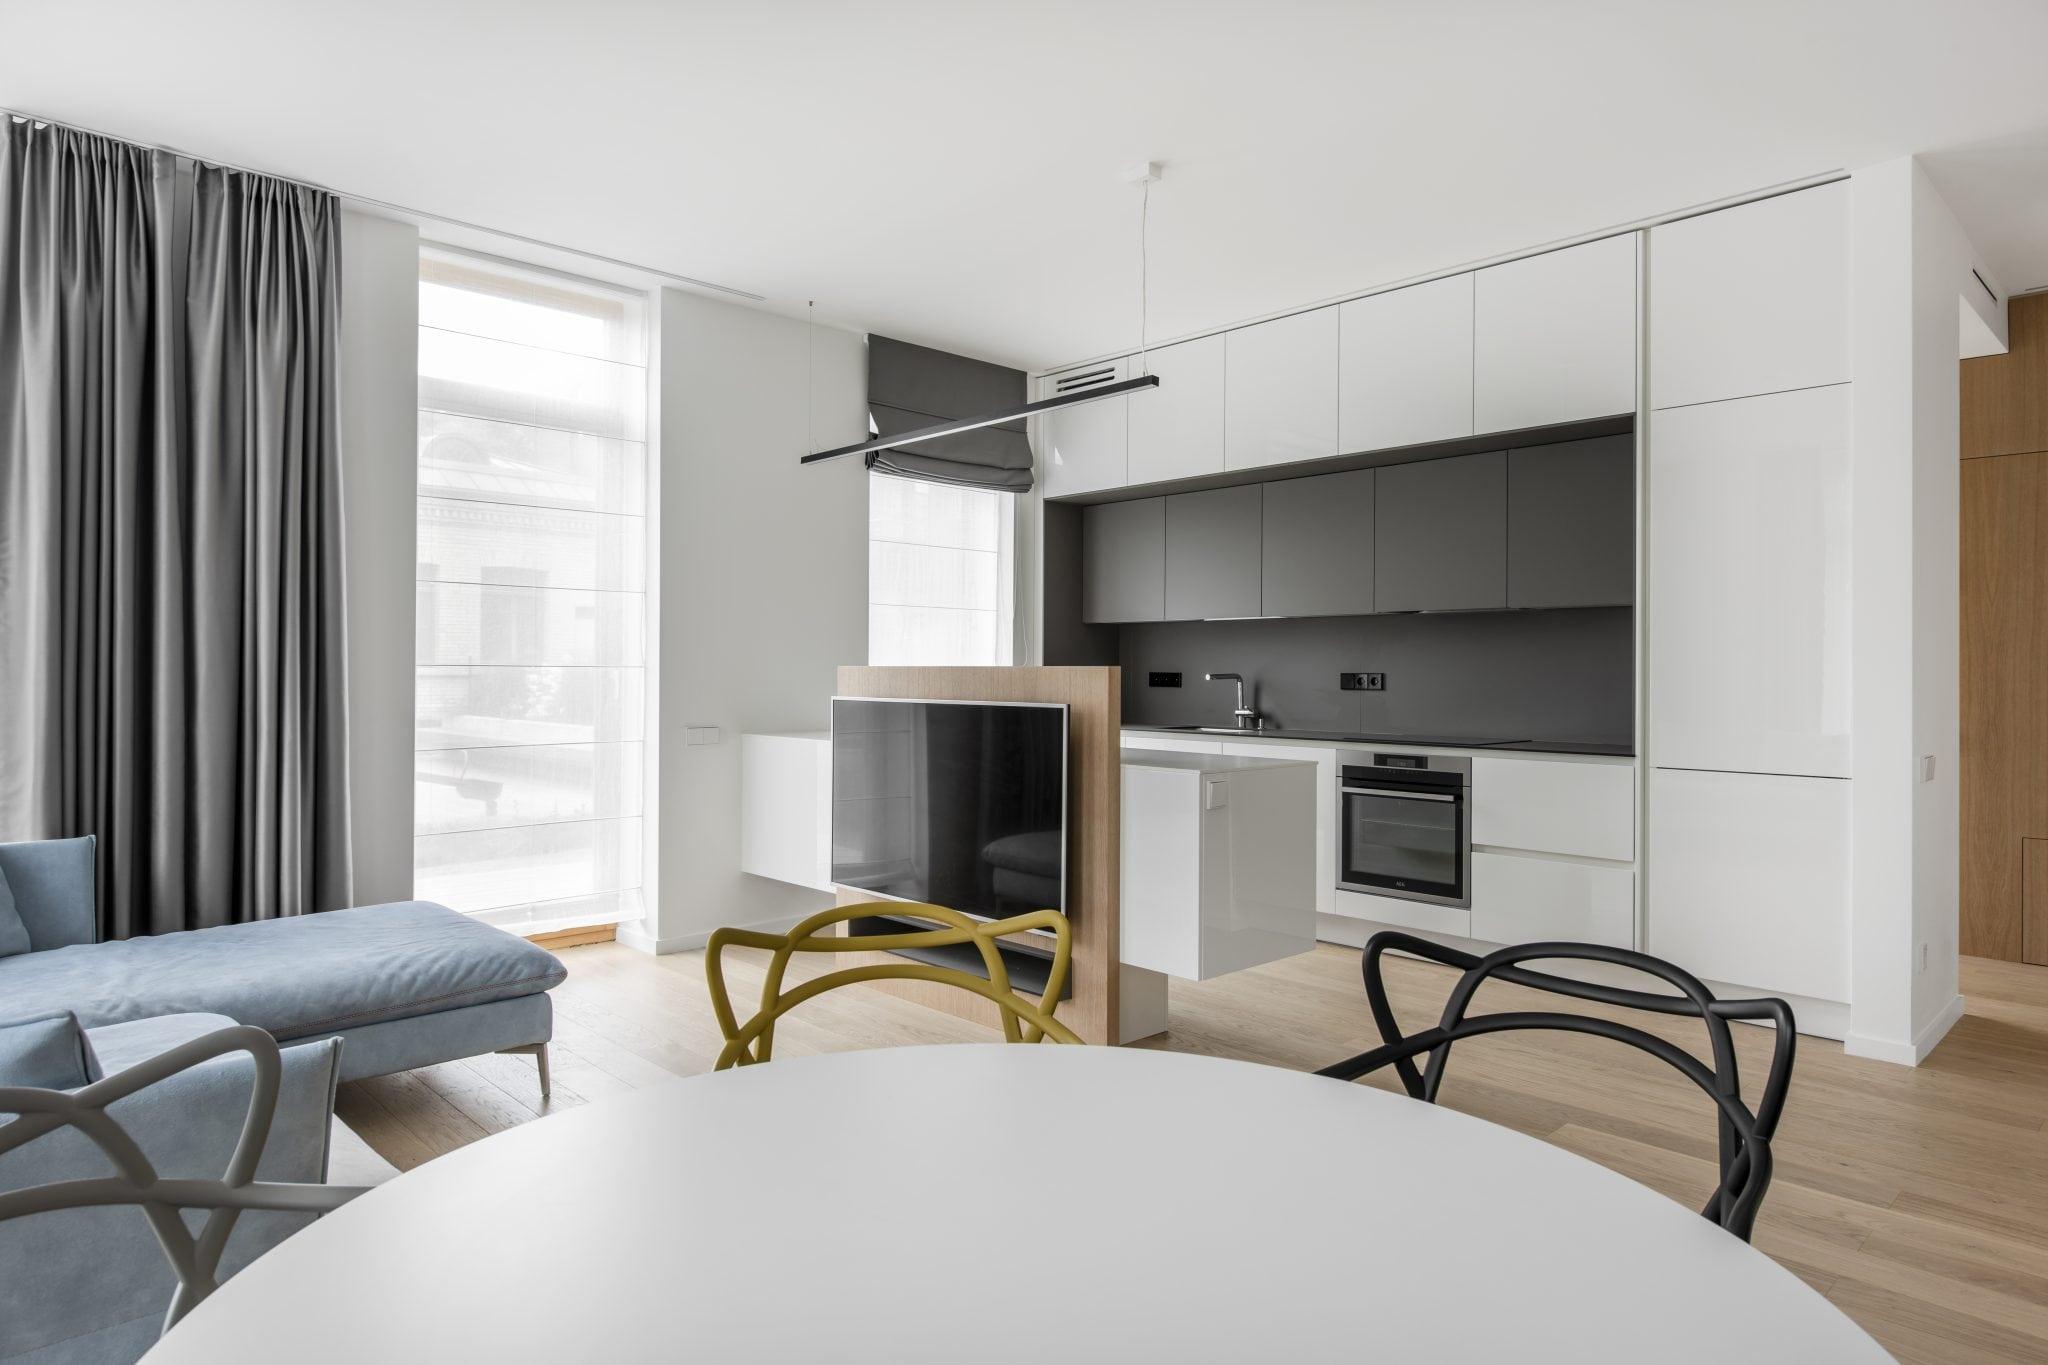 Baldu gamyba modernus virtuves baldai Zverynas